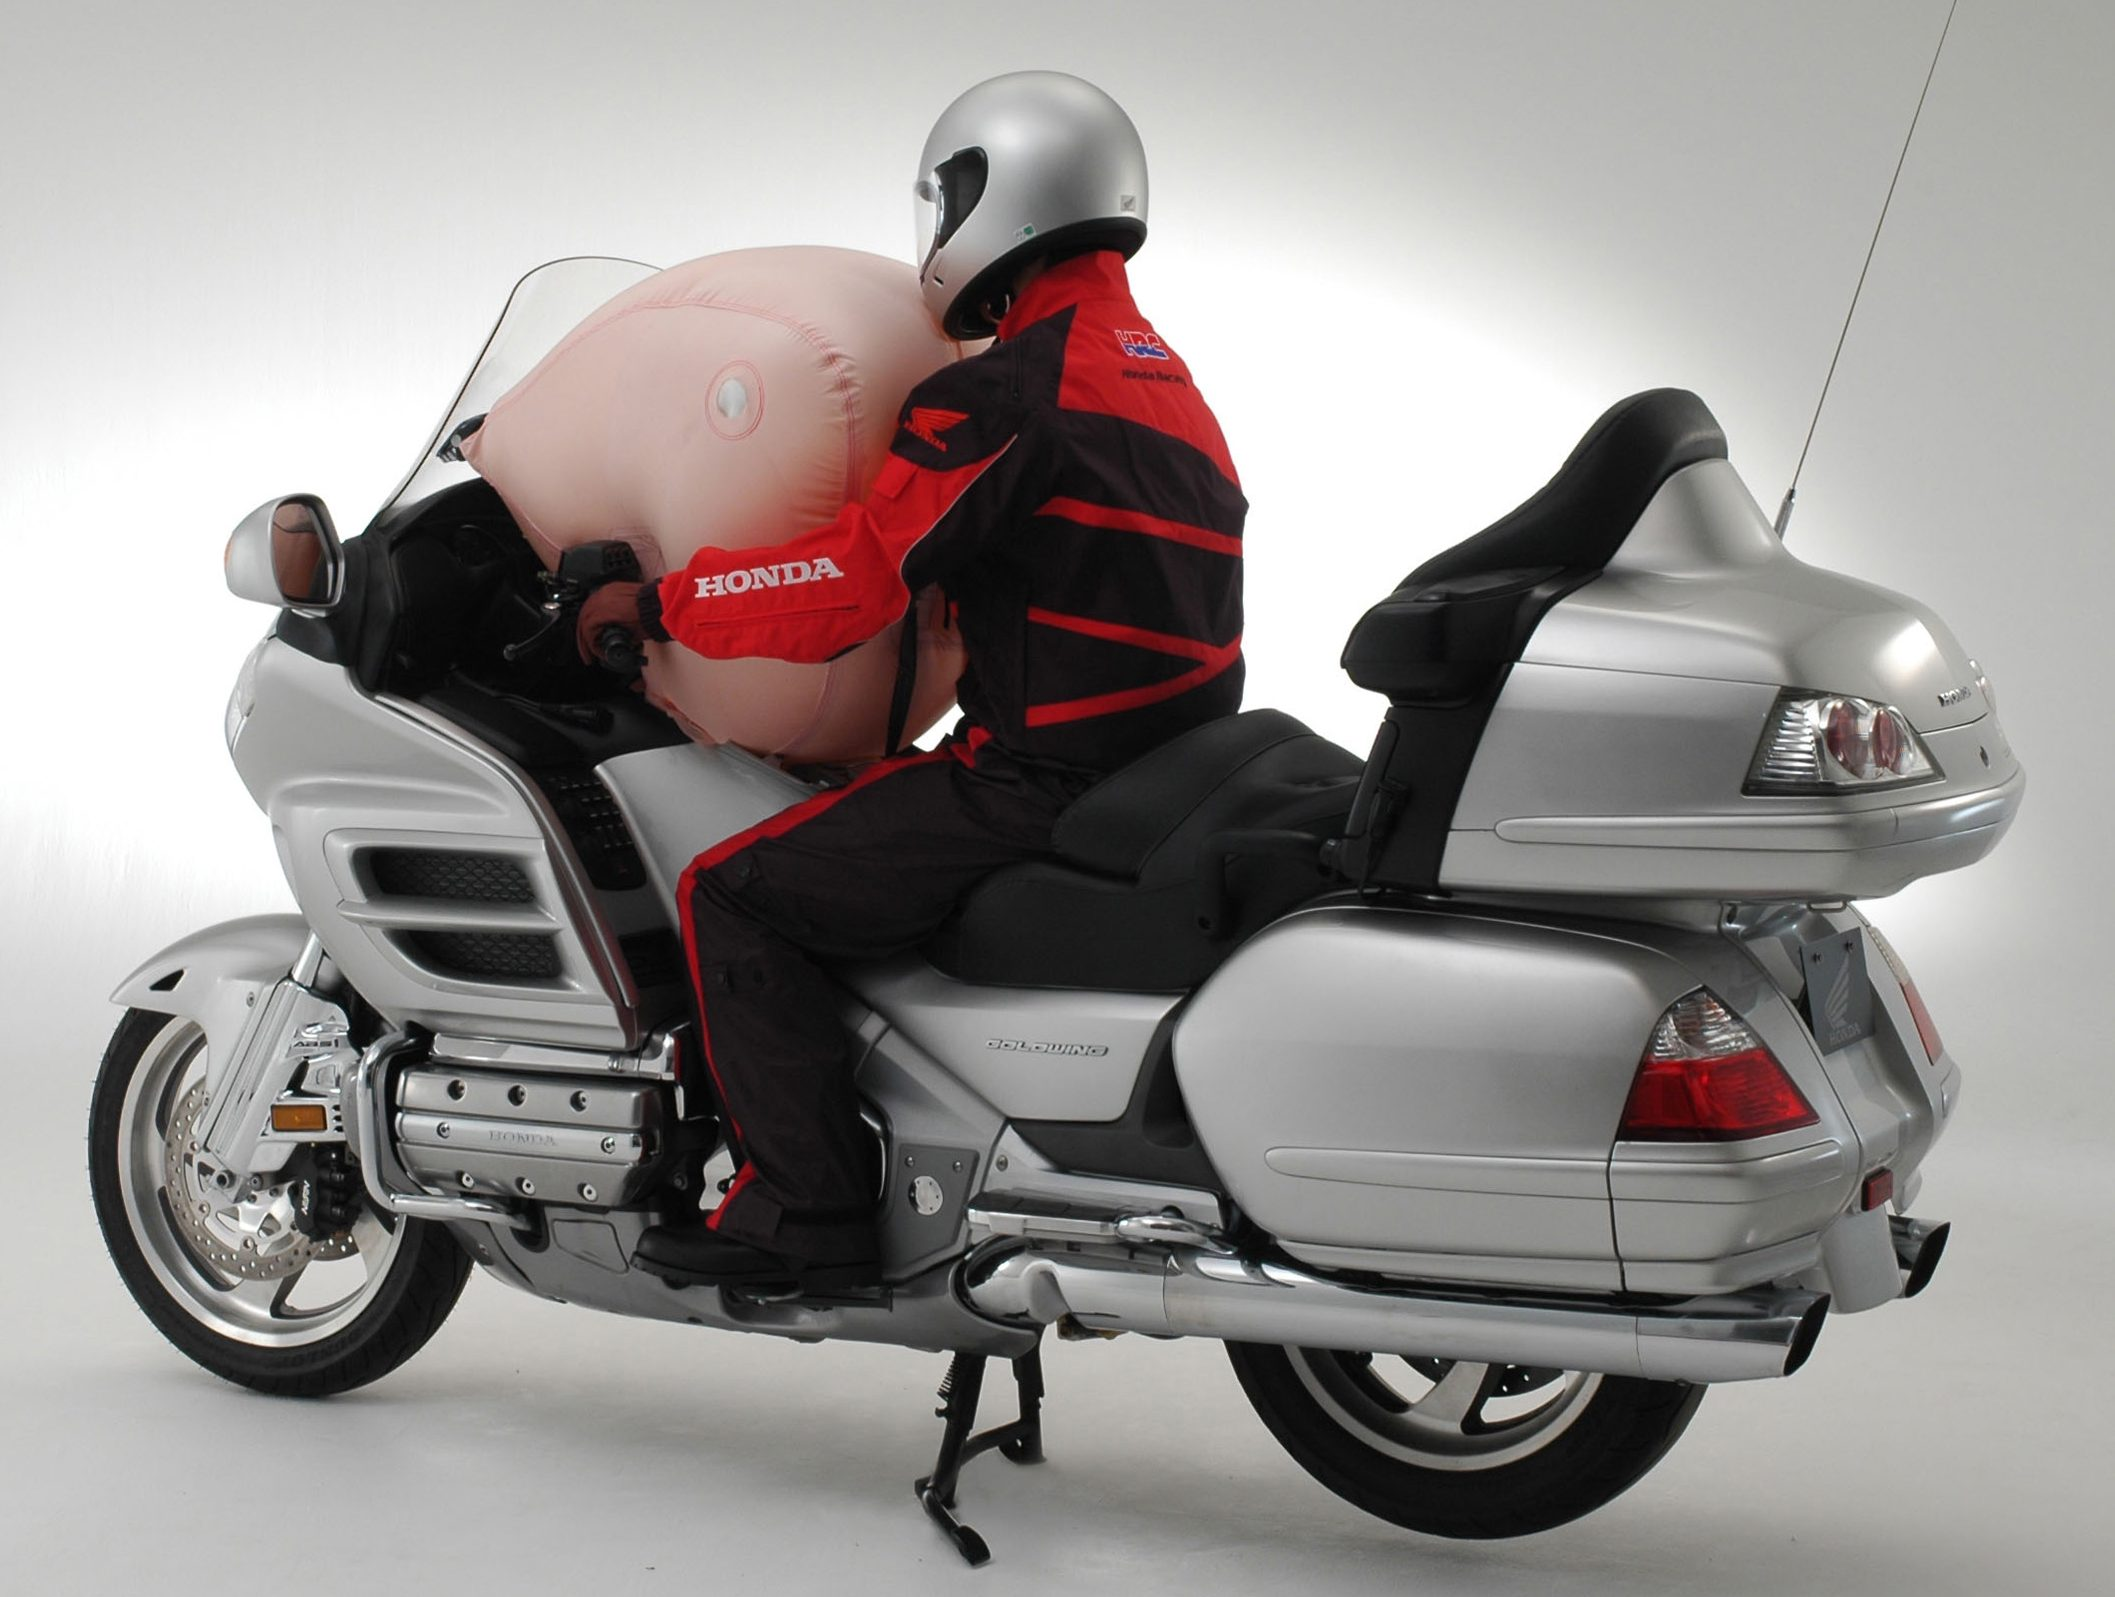 BMW Airbag Recall >> 2006-2010 Honda Gold Wing - Takata airbag recall